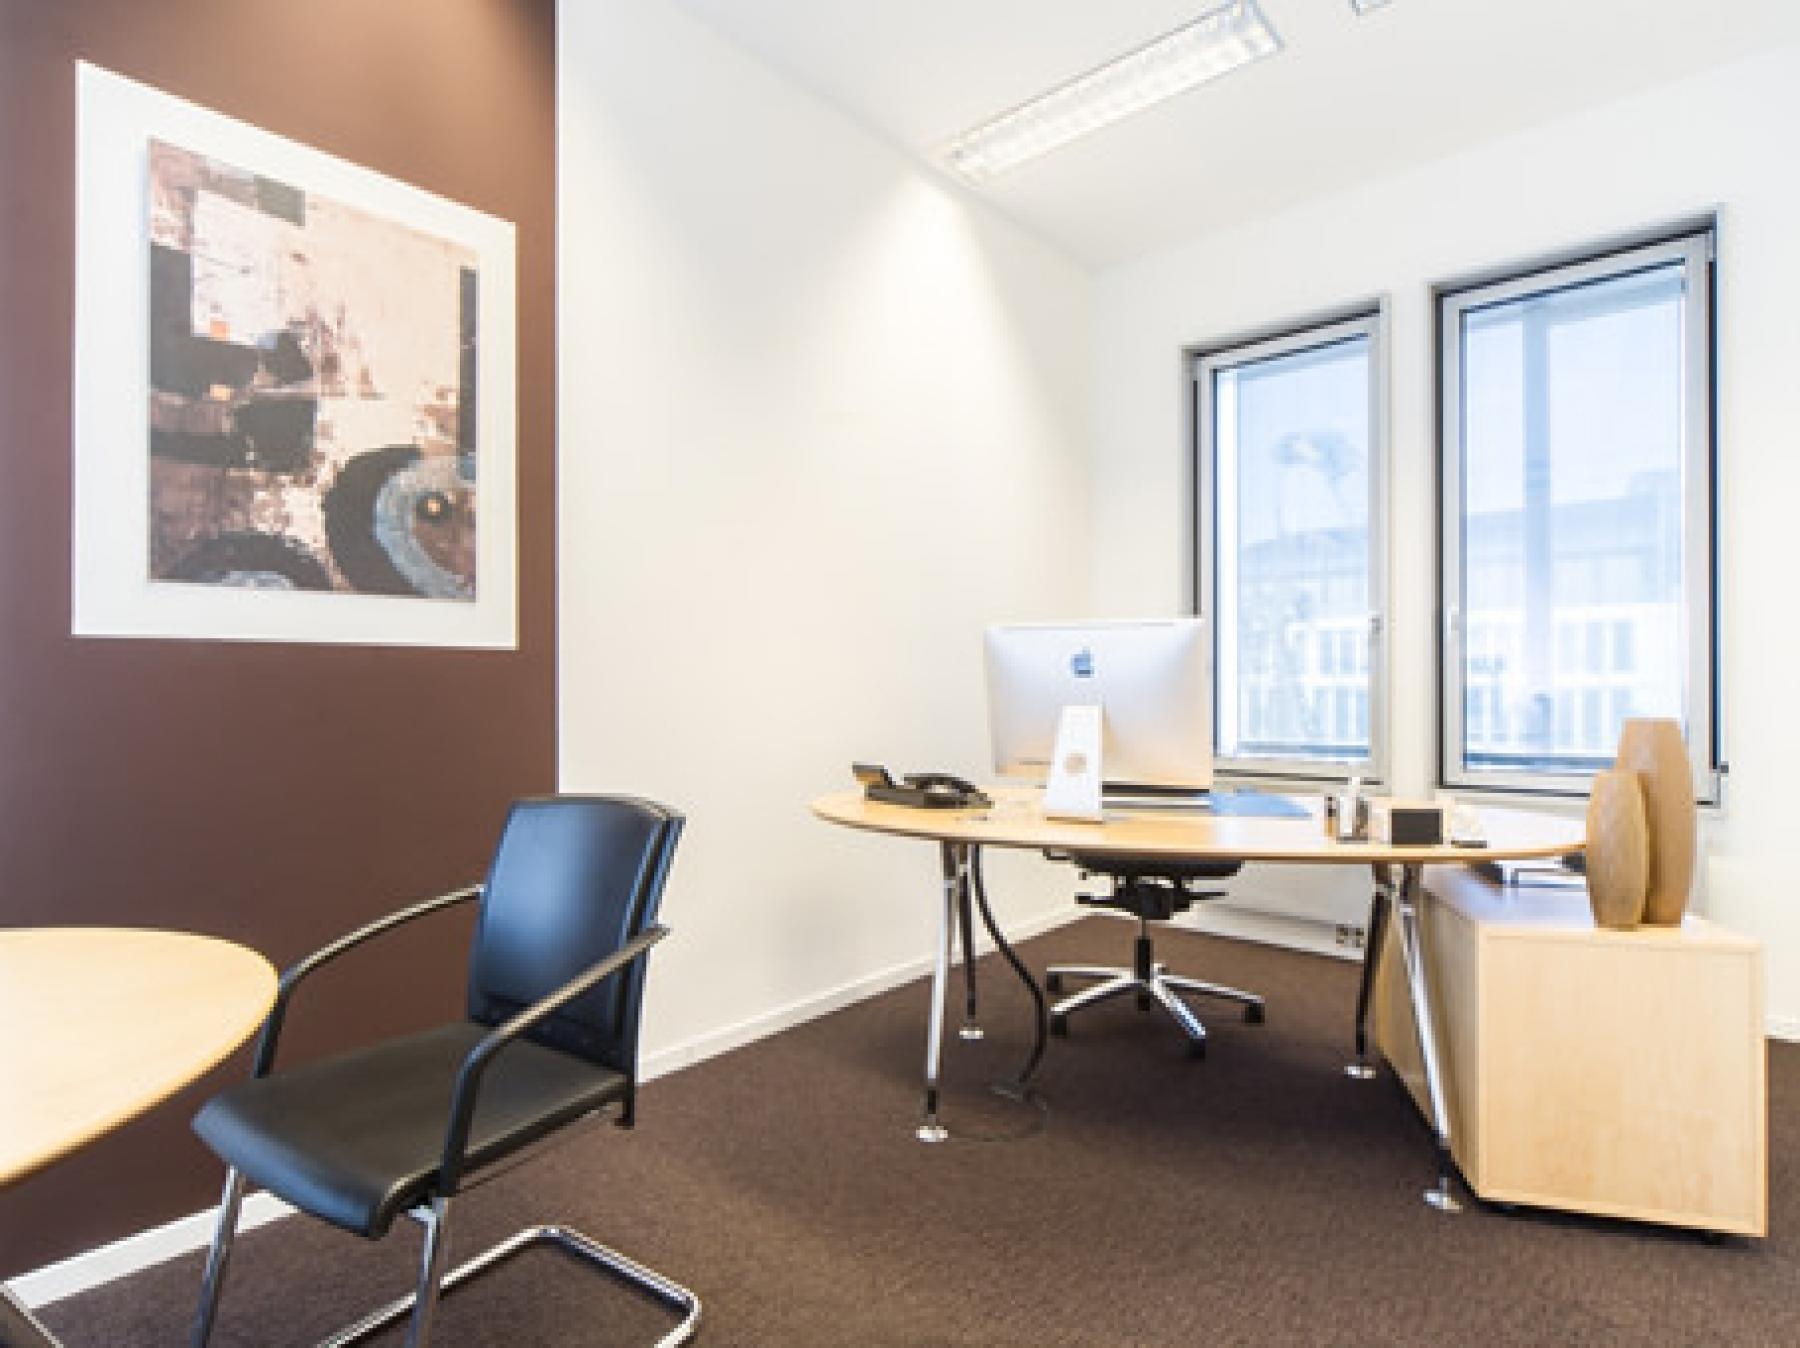 Hochwertiges Büro mieten in Berlin Unter den Linden